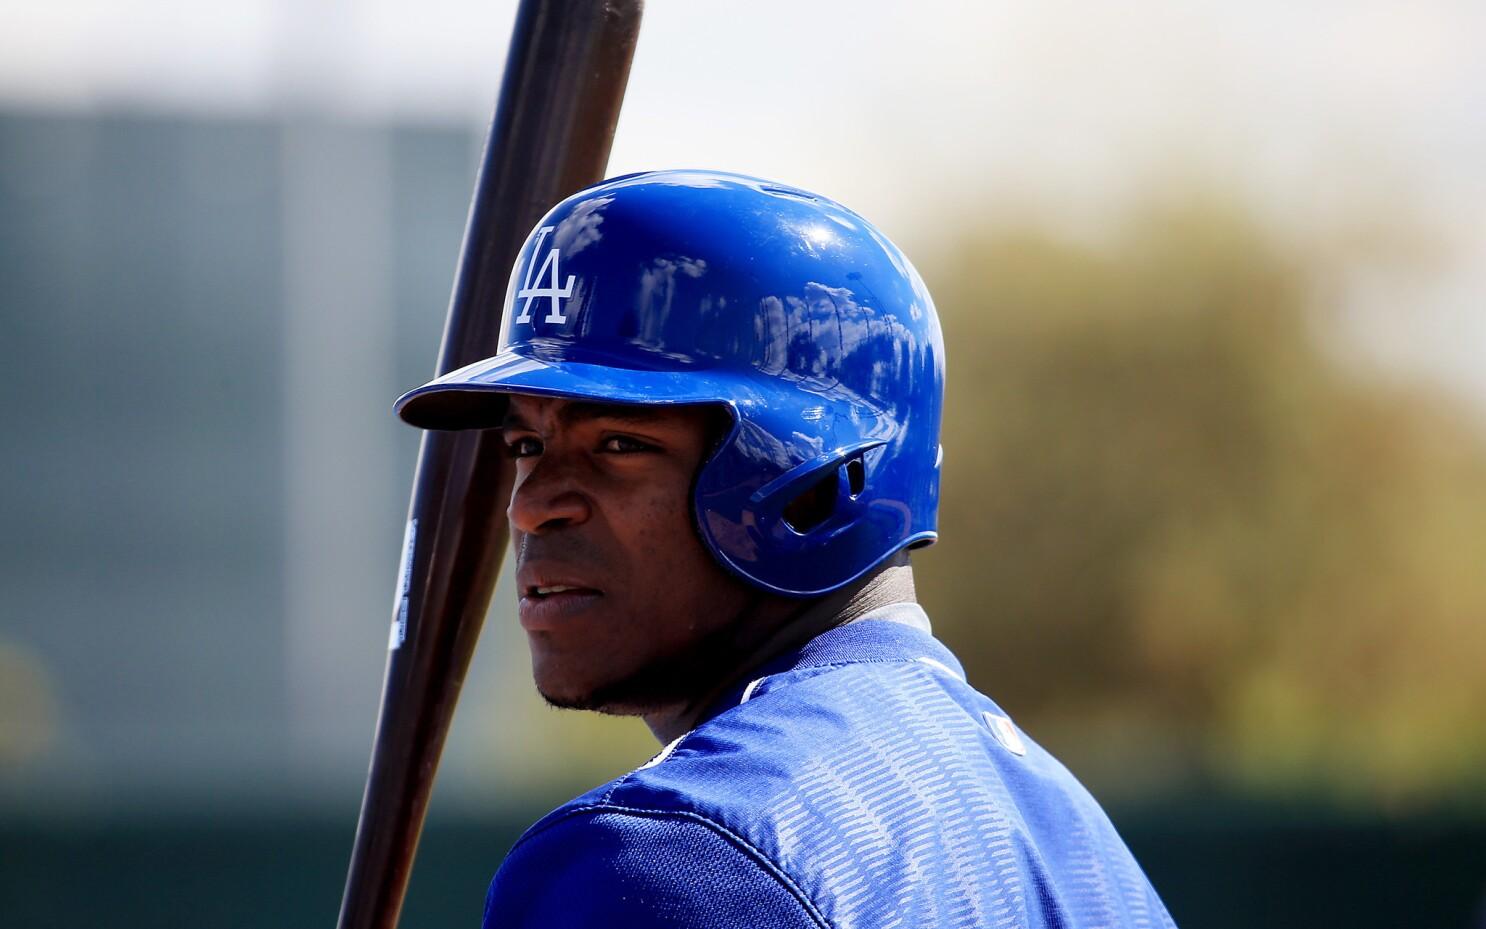 Dodgers' Yasiel Puig smuggler sentenced to one-month prison term